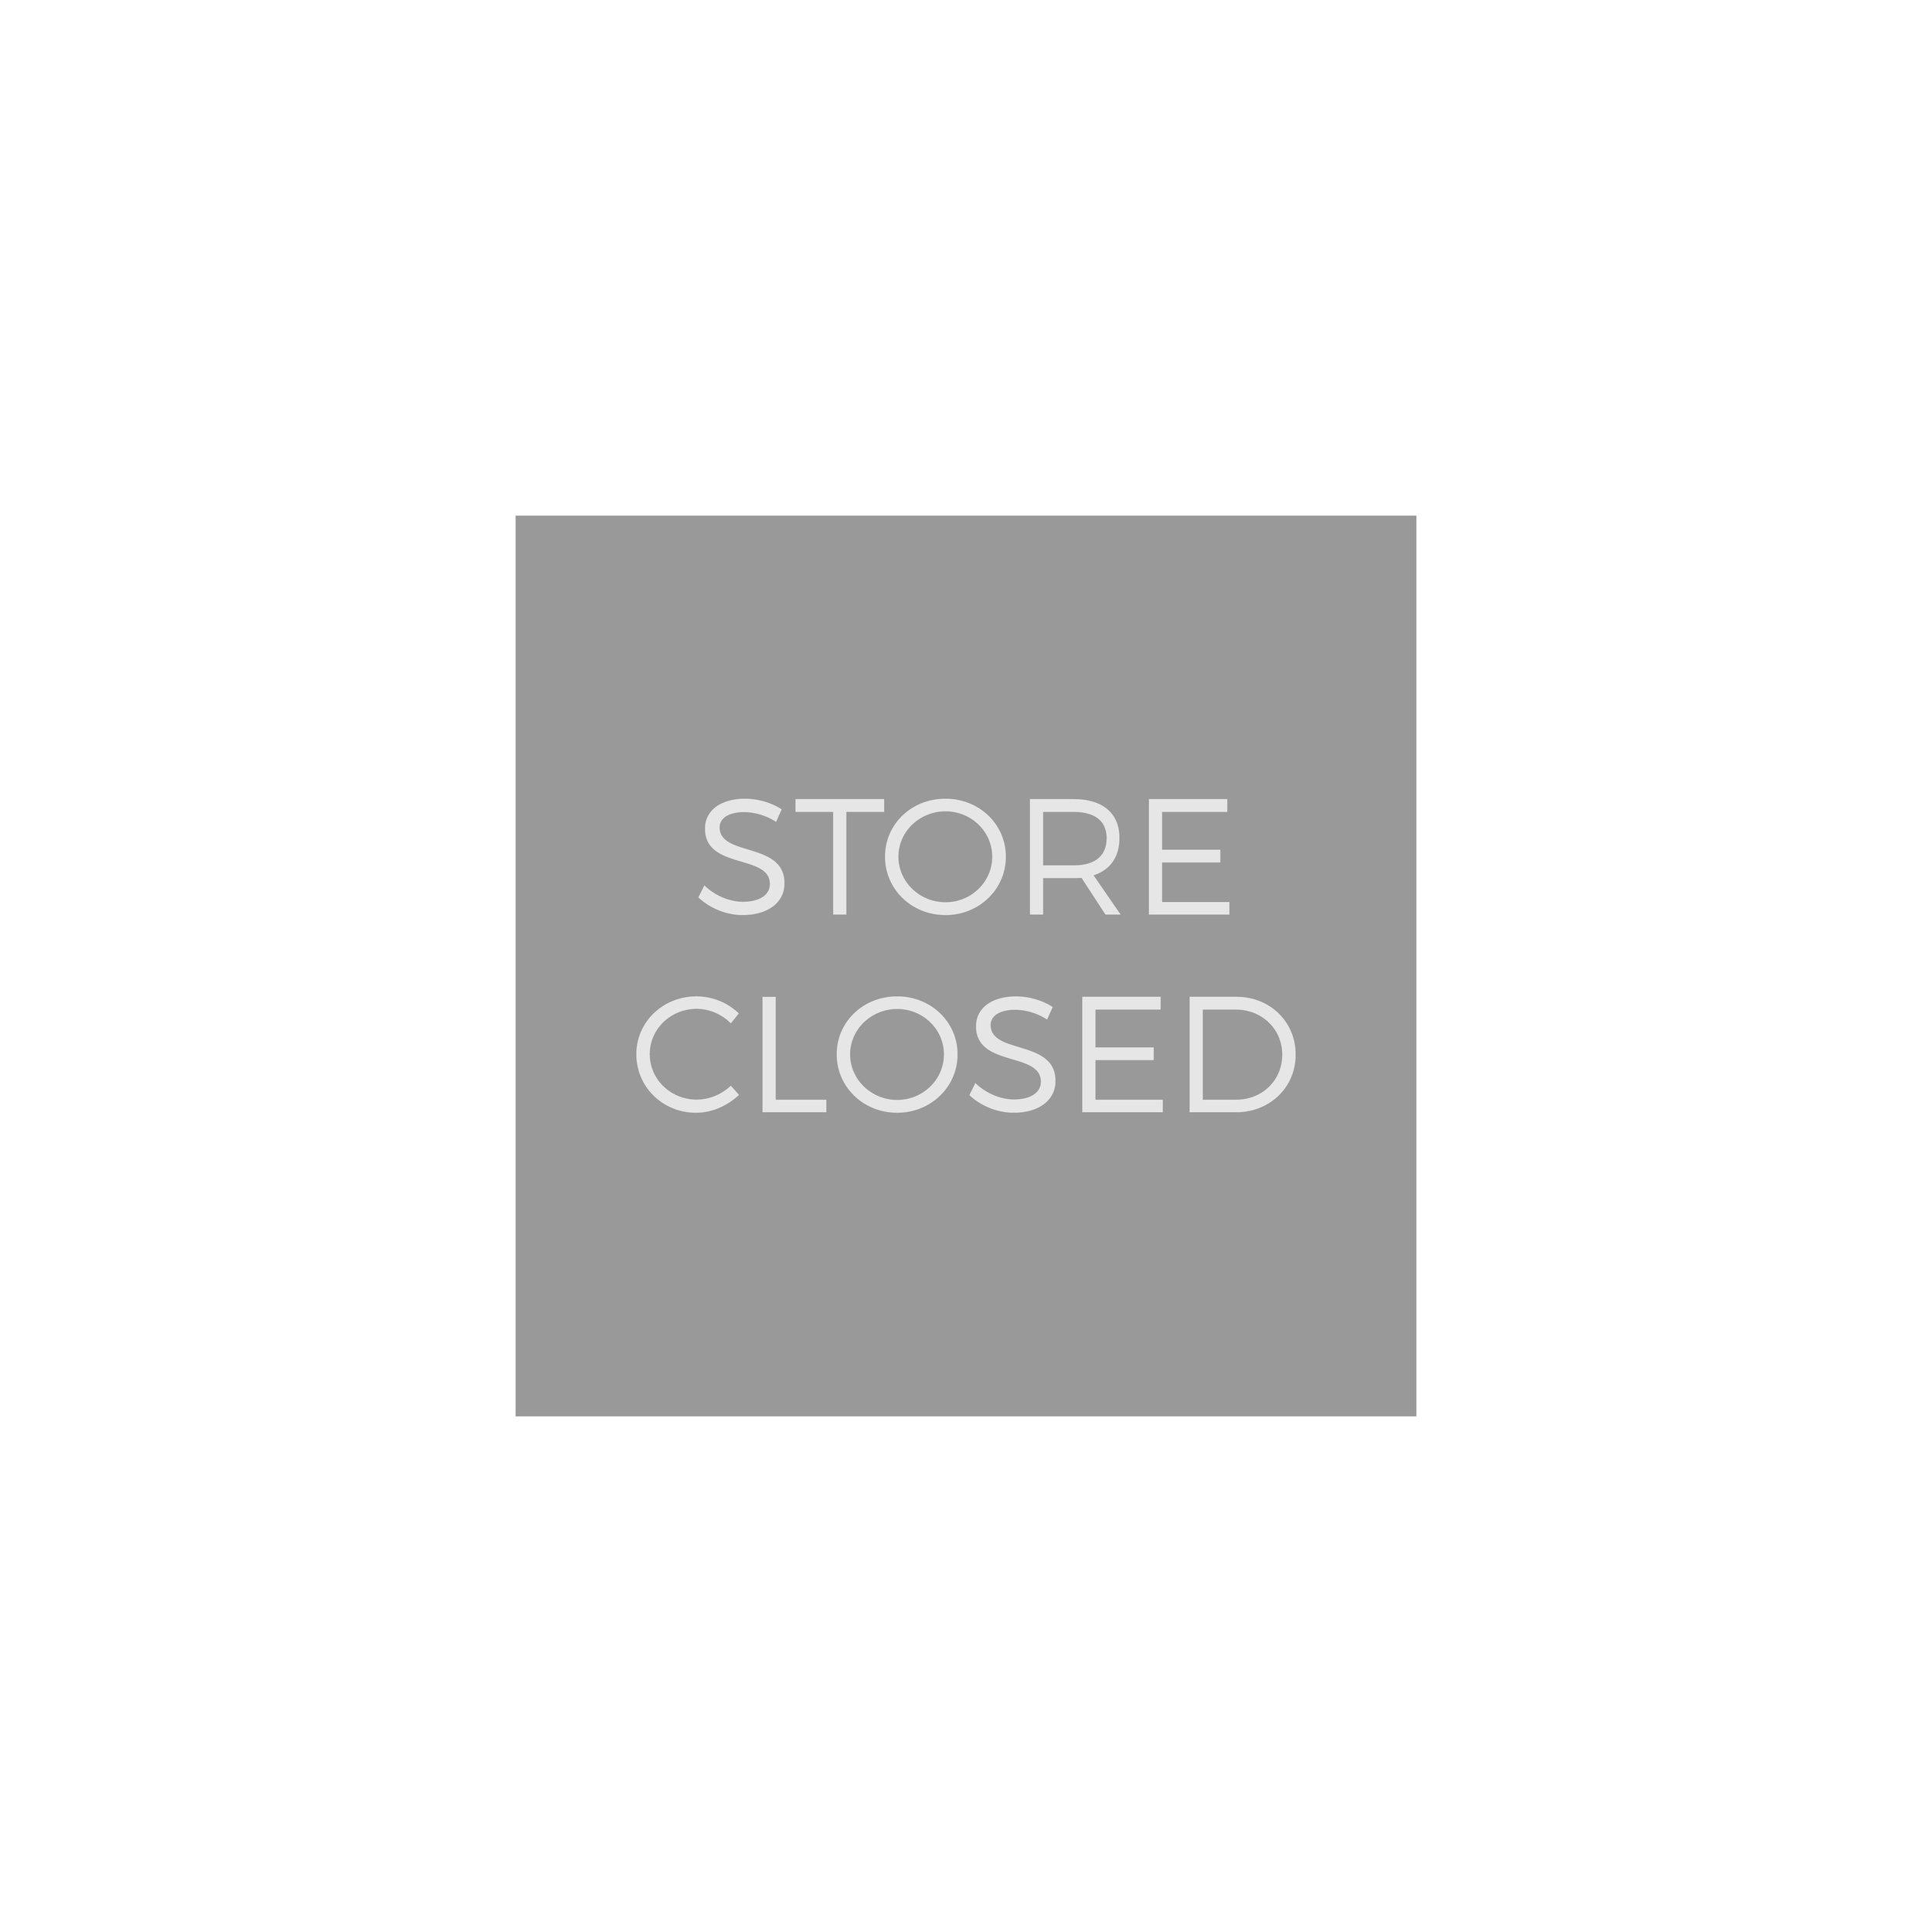 storeClosed.jpg